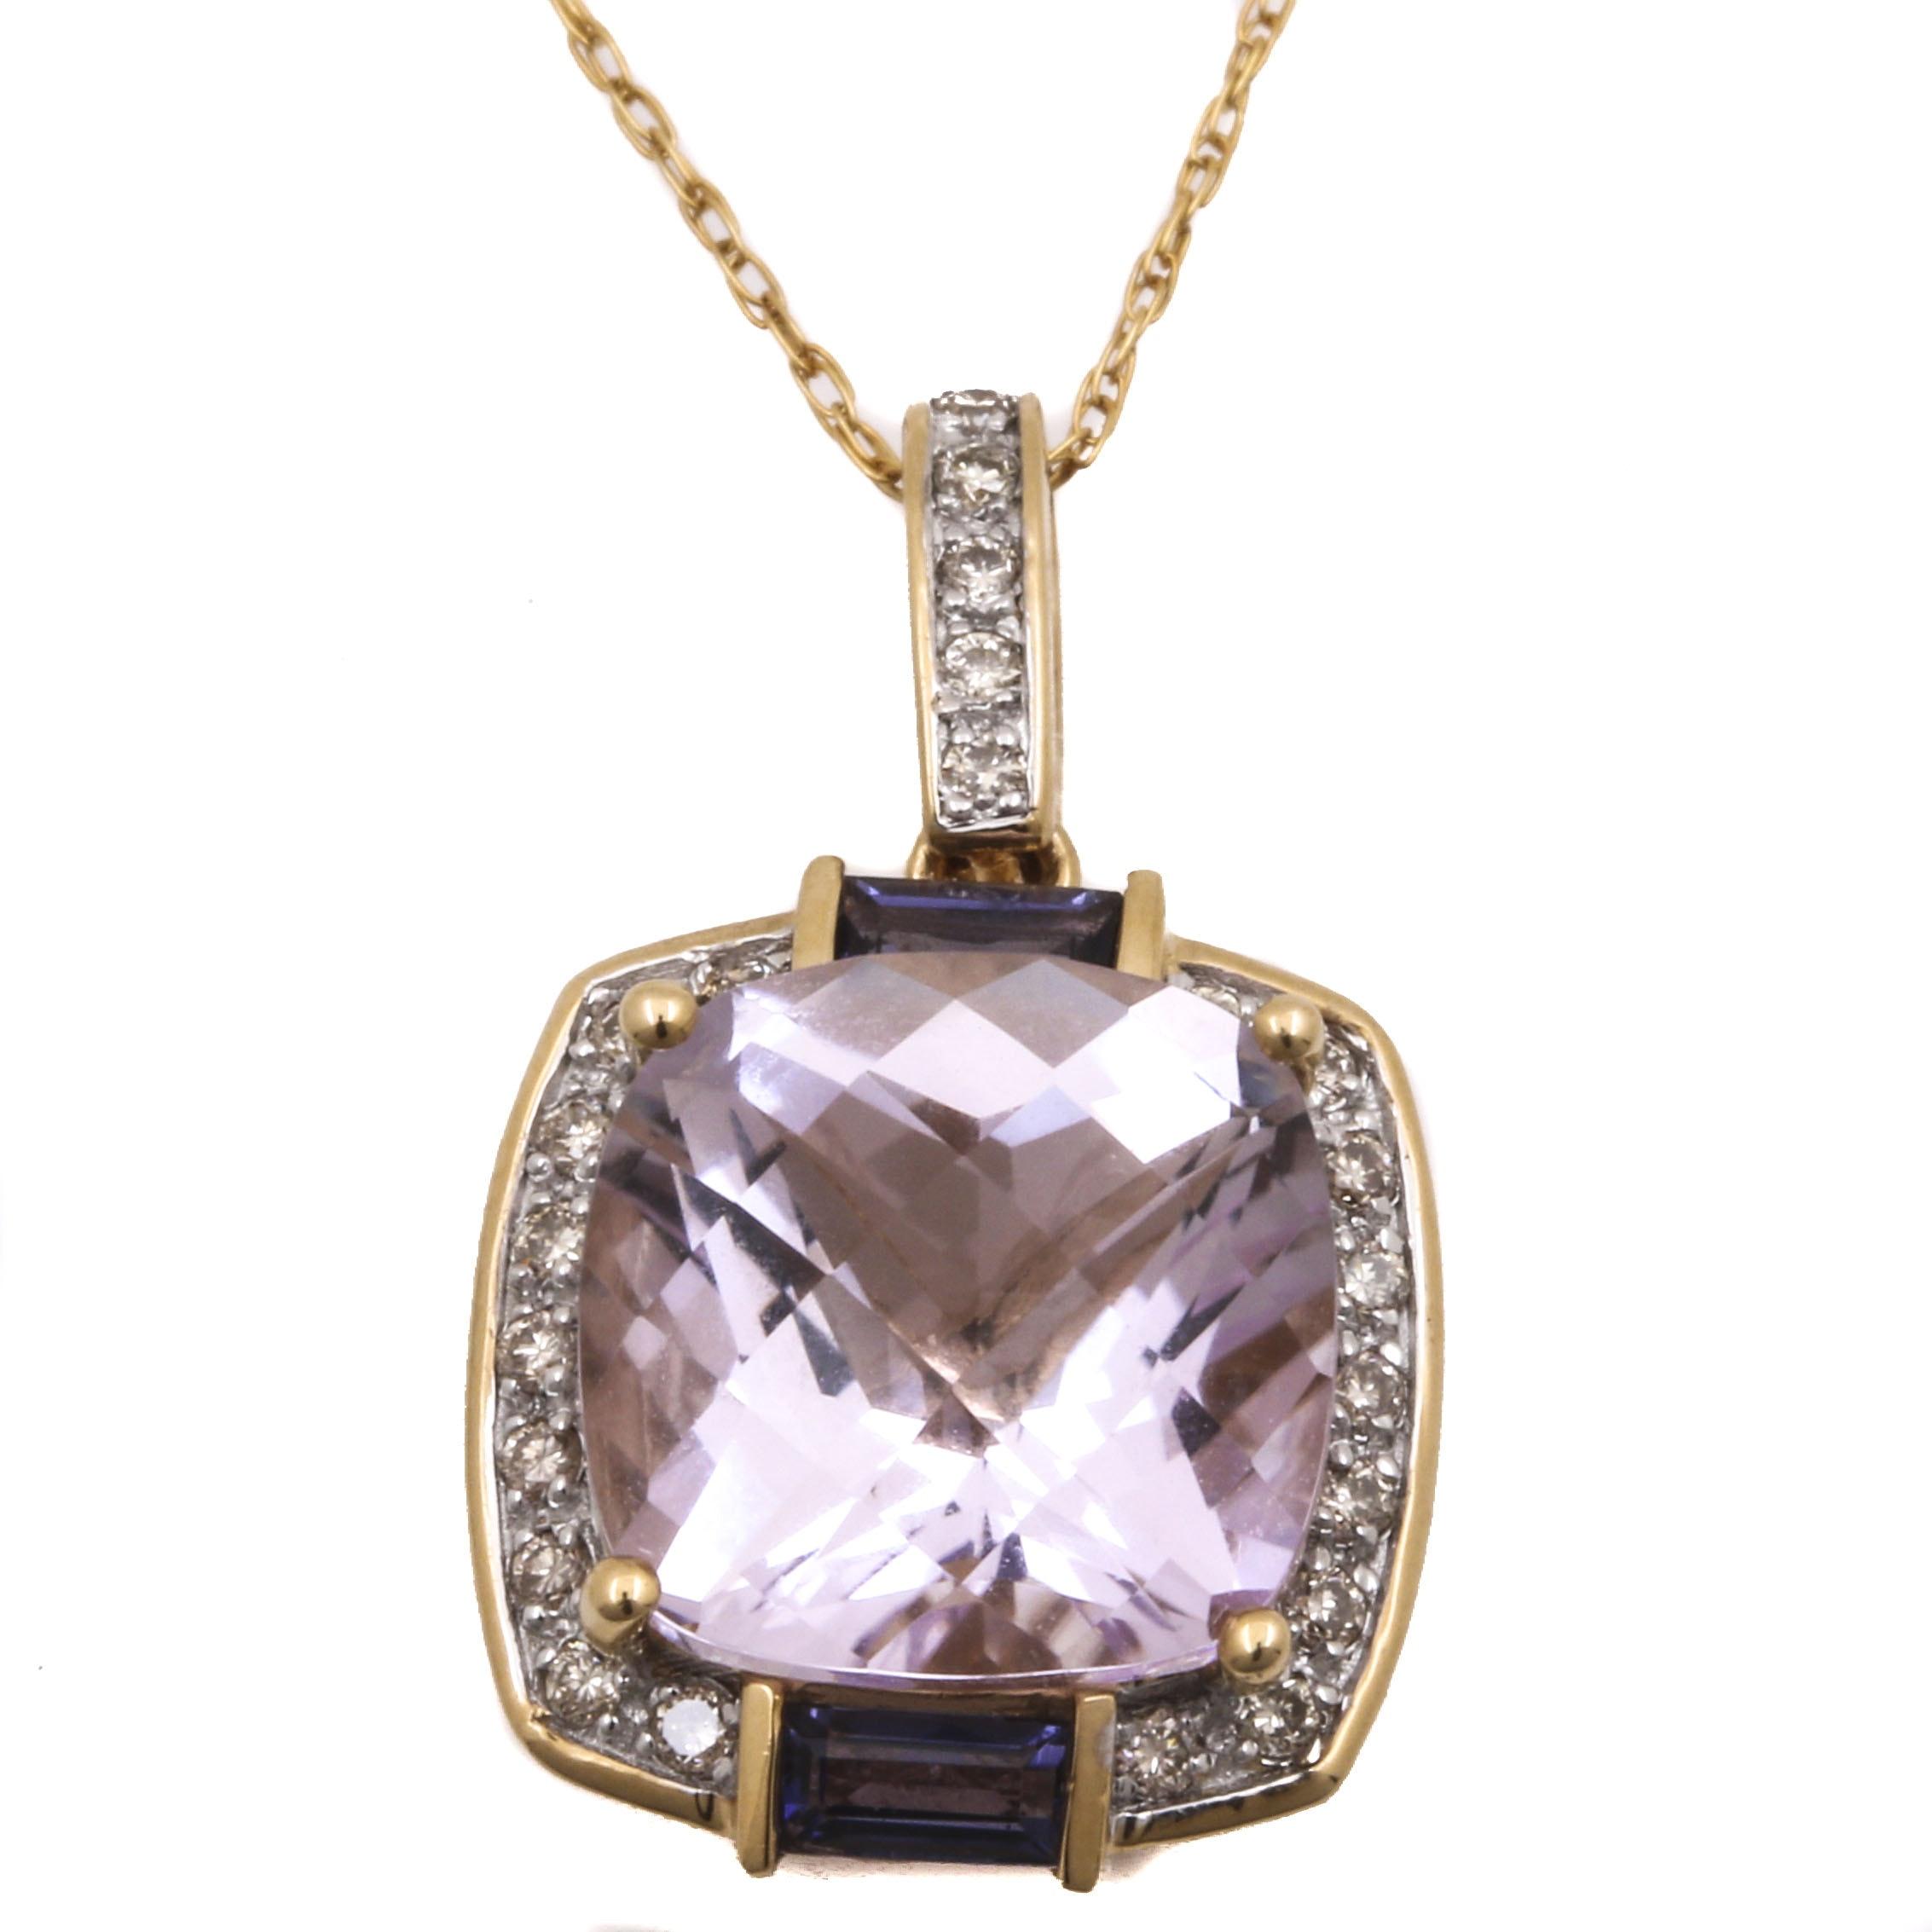 14K Yellow Gold Gemstone and Diamond Pendant Necklace